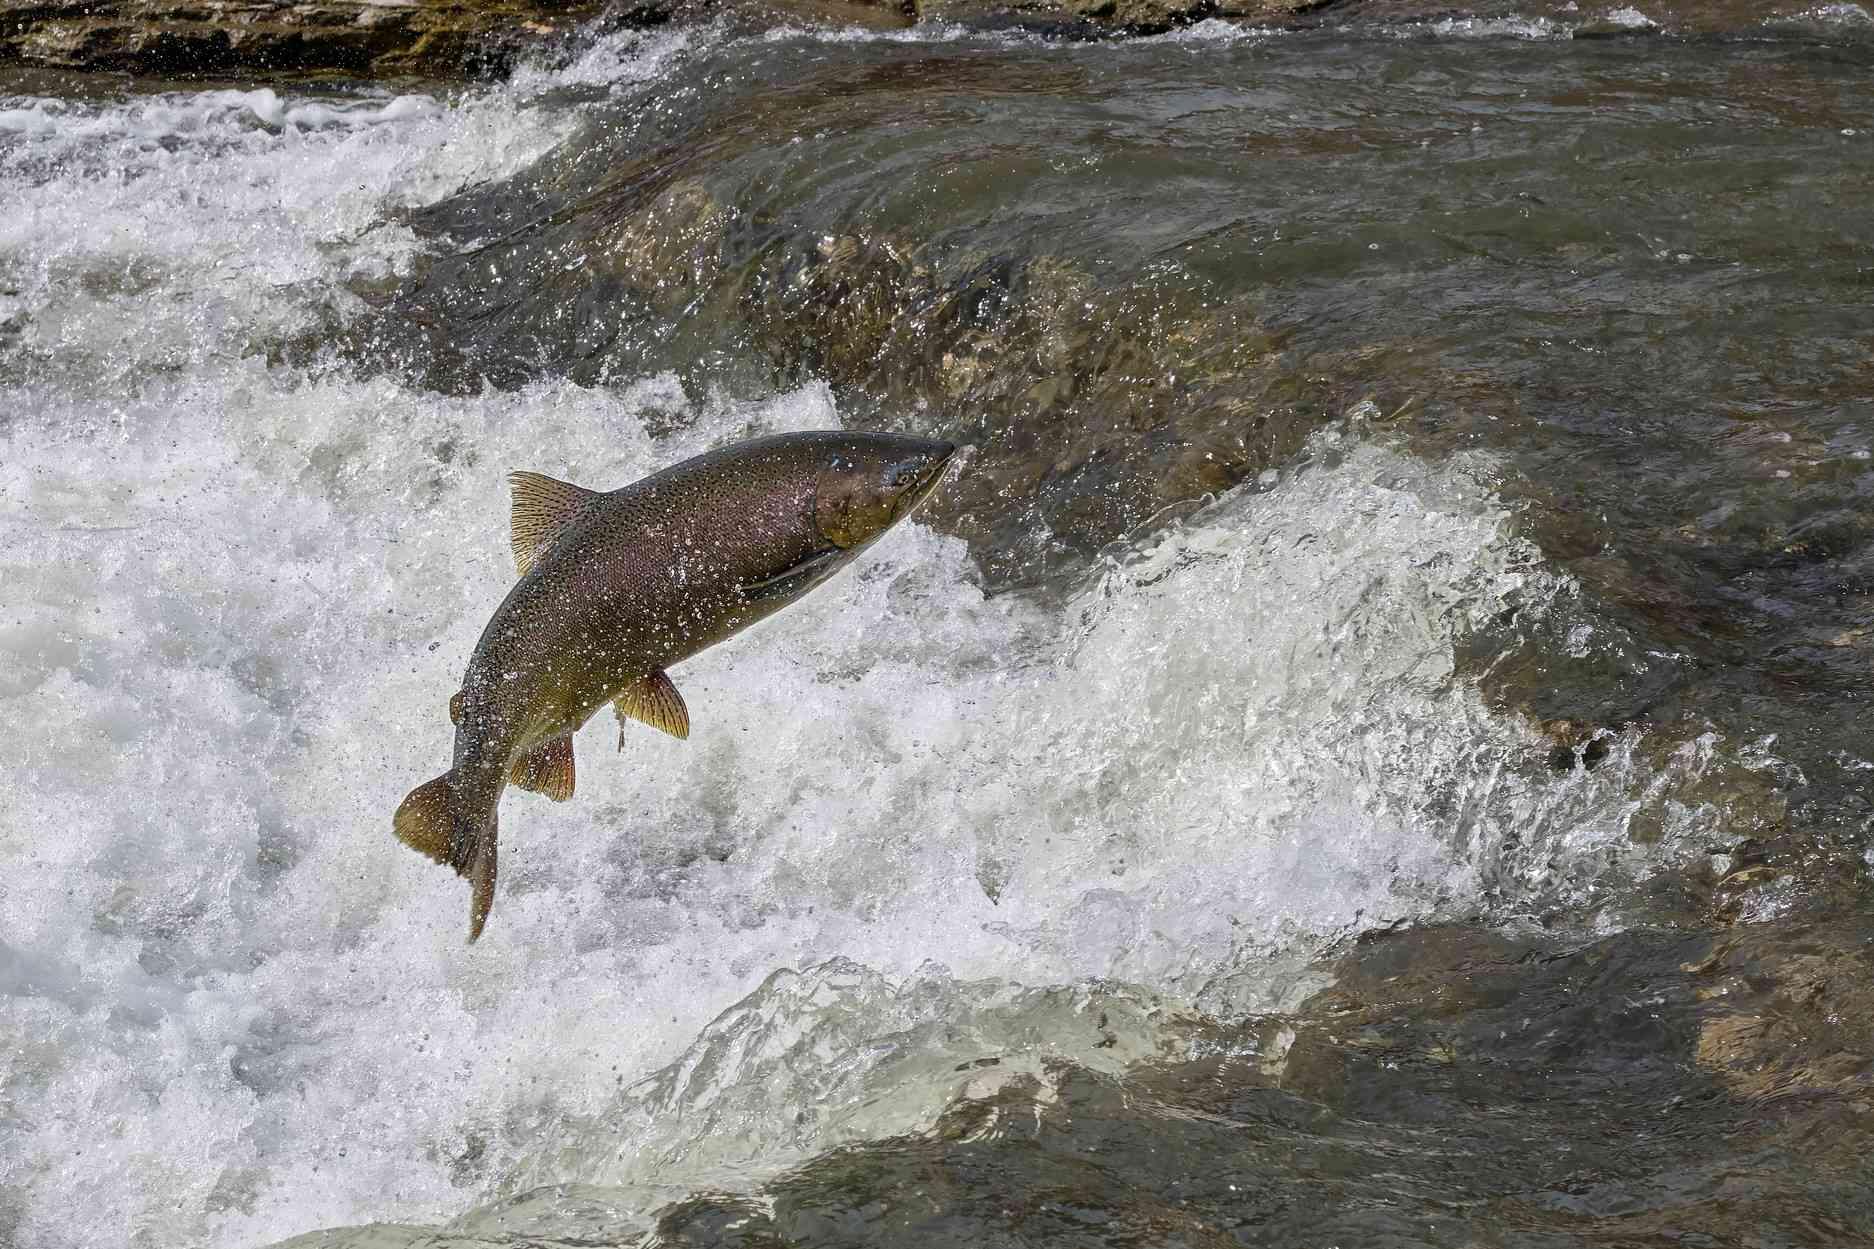 tan chinook salmon jumps above turbulent water